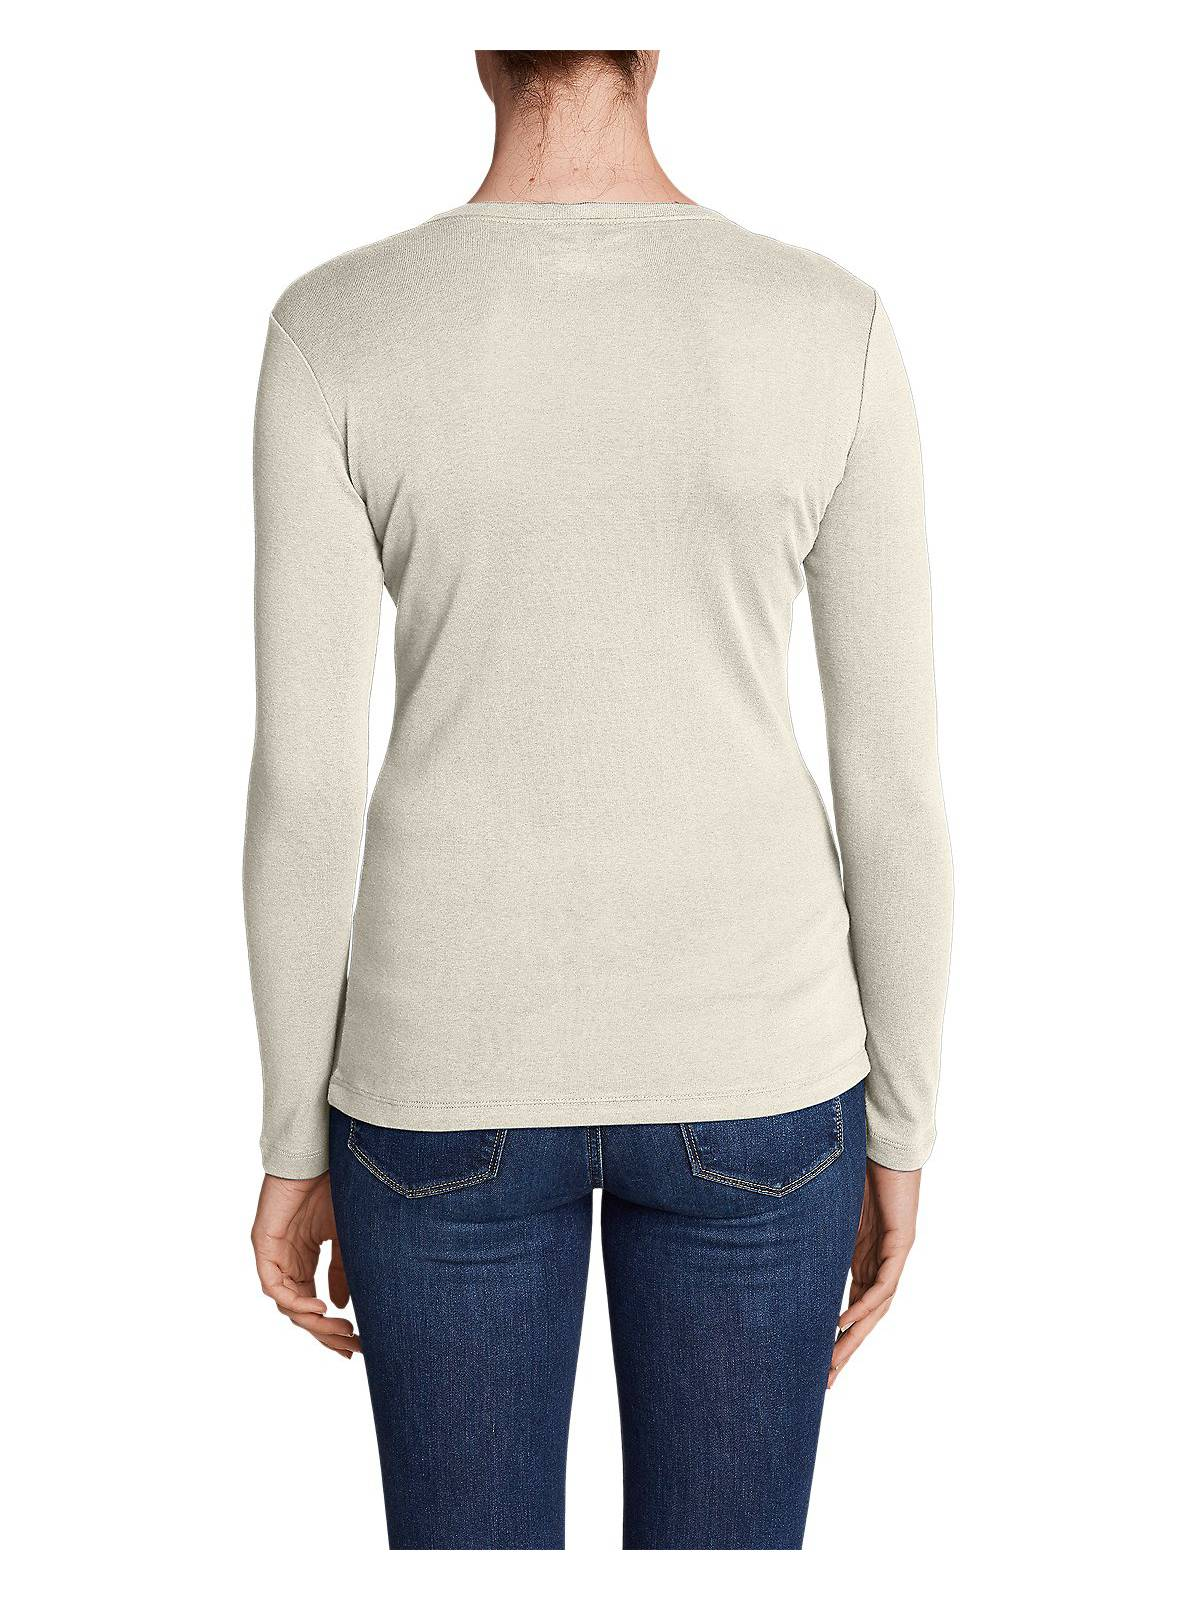 Eddie-Bauer-Women-039-s-Favorite-Long-Sleeve-Crewneck-T-Shirt thumbnail 32